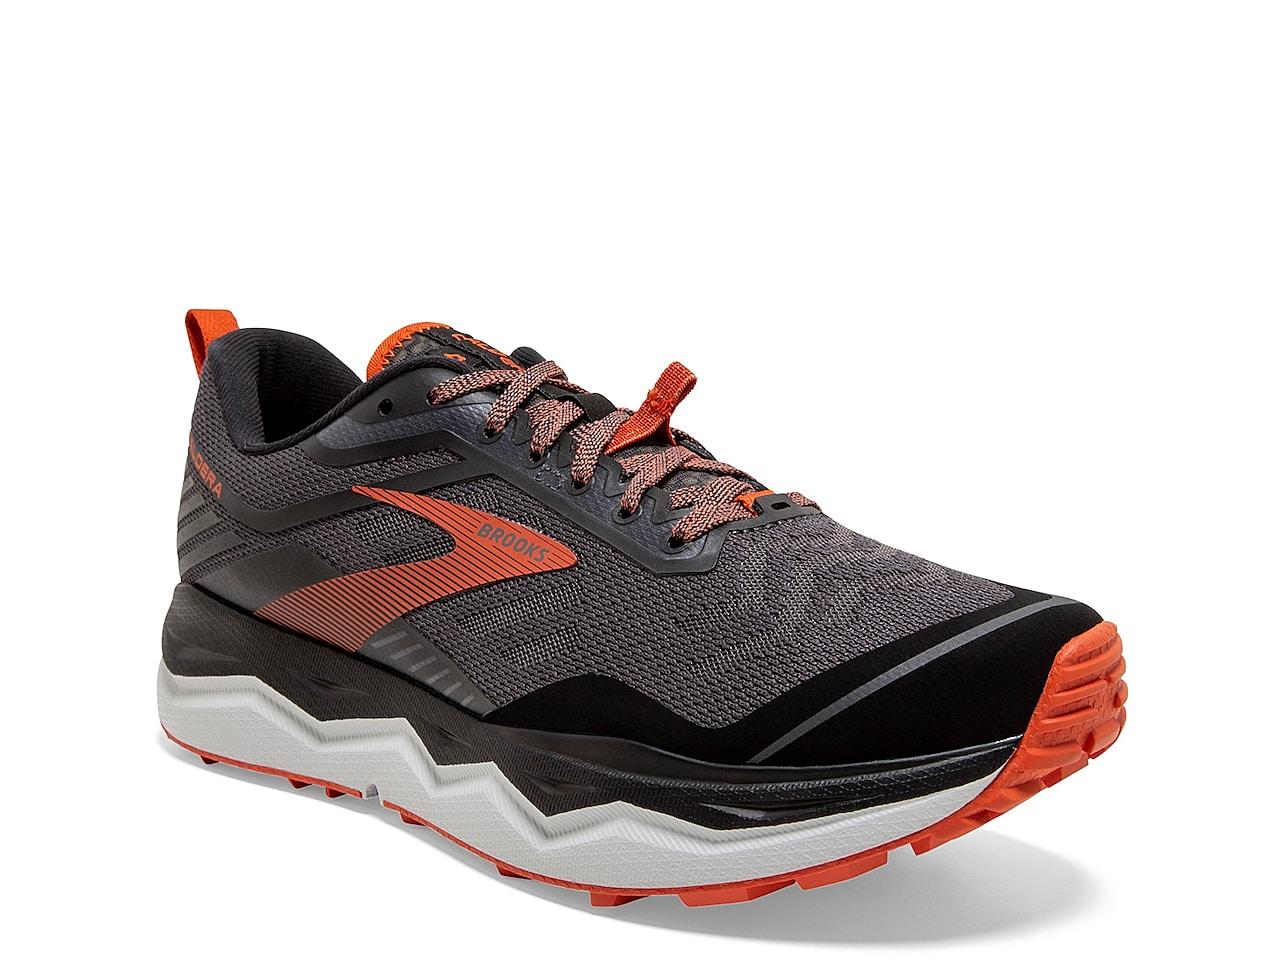 Brooks Caldera 4 Trail Running Shoe - Men's